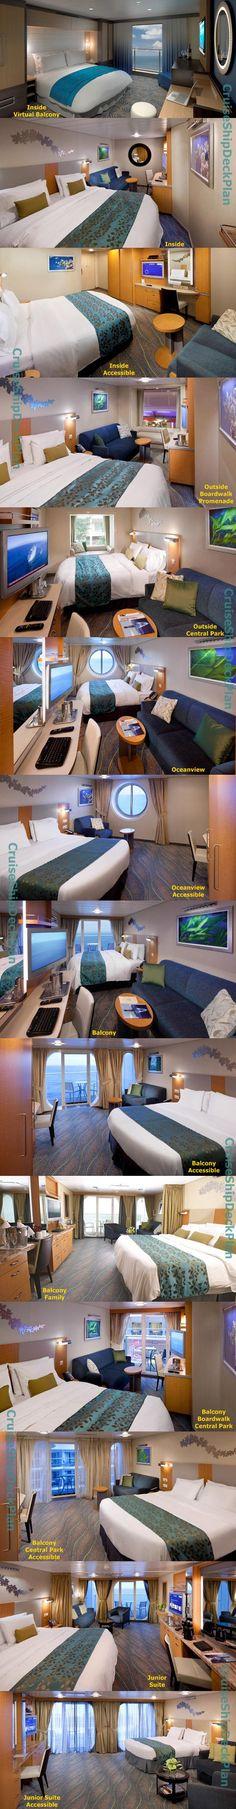 Royal Caribbean Allure of the Seas cabins photos